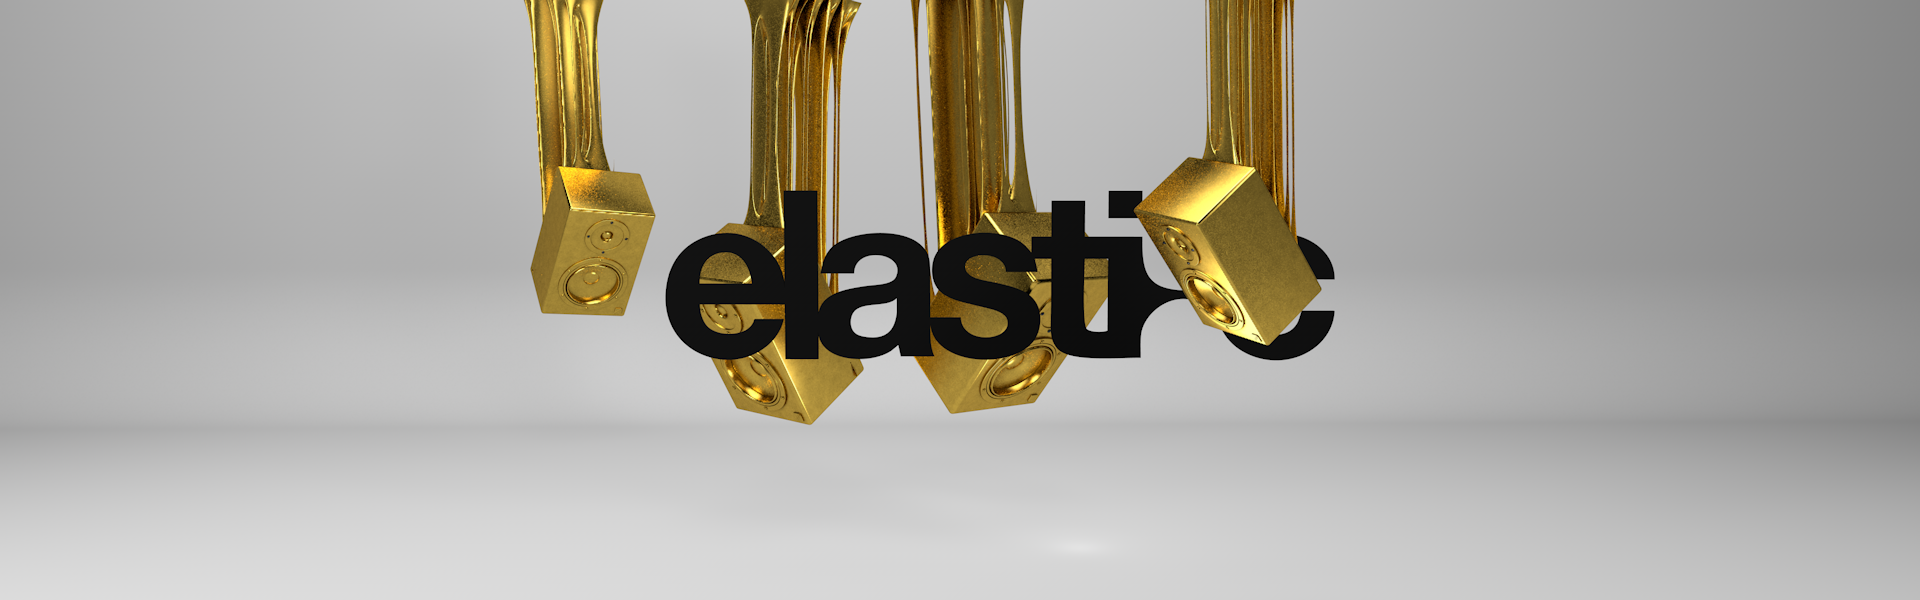 elastic-gold